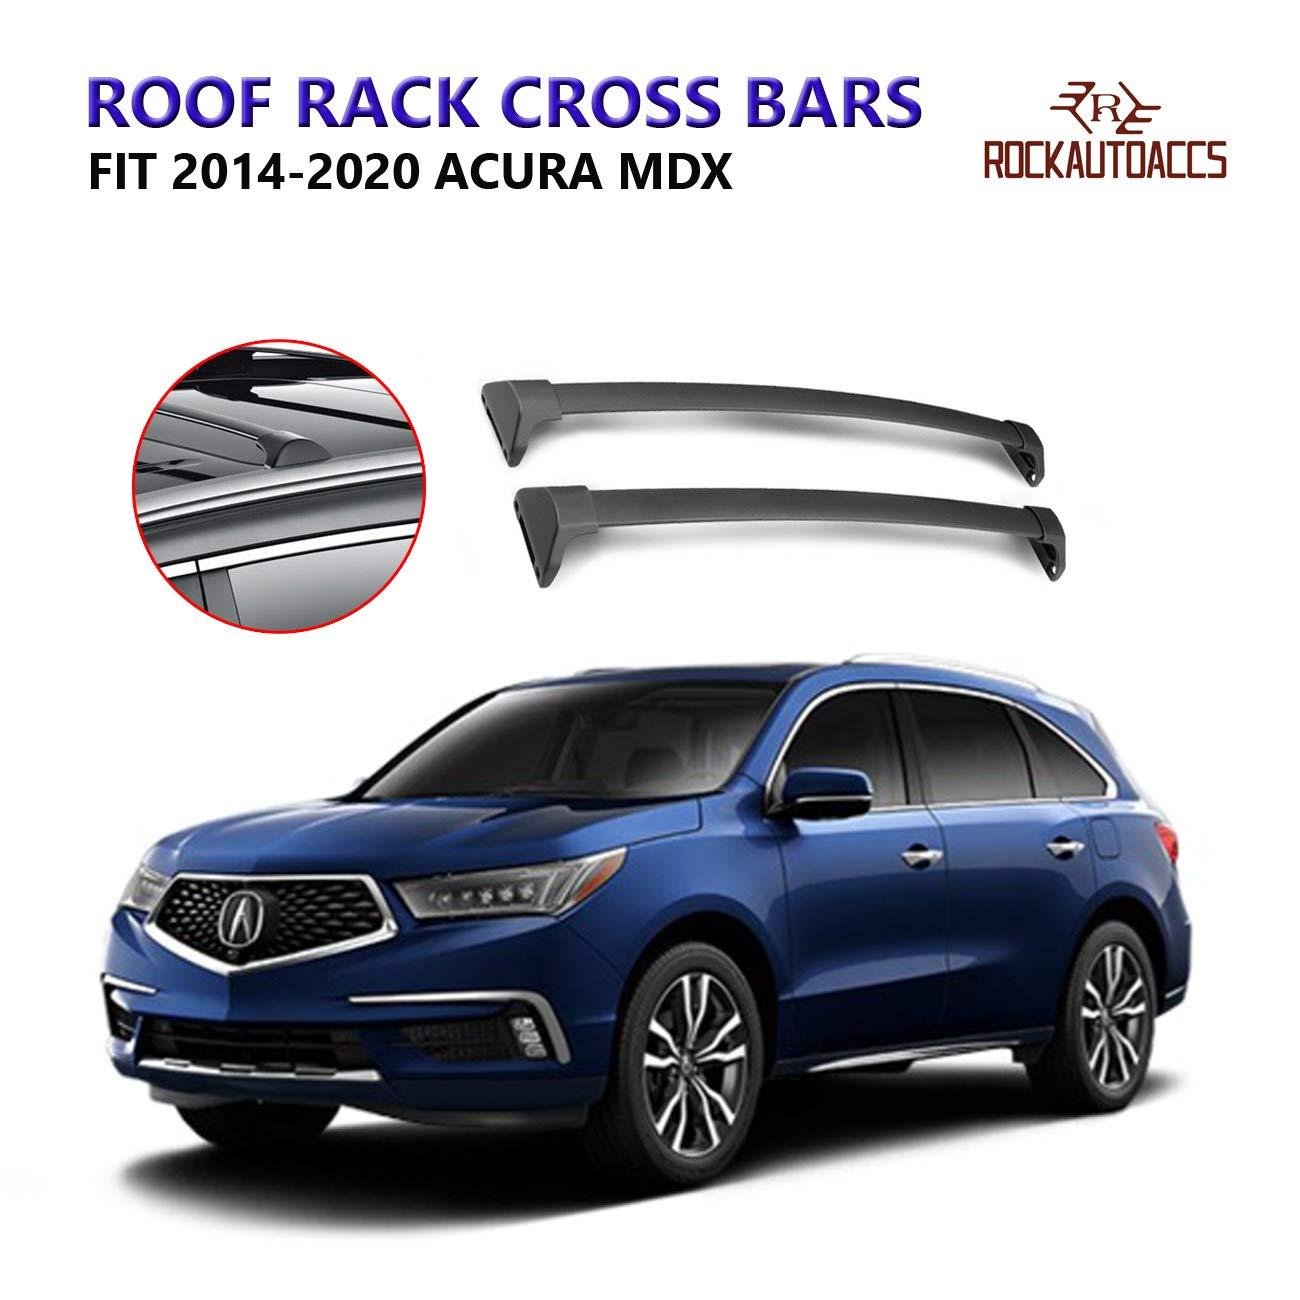 ROKIOTOEX Roof Rack Crossbars Roof Rail Cross Bars Fit